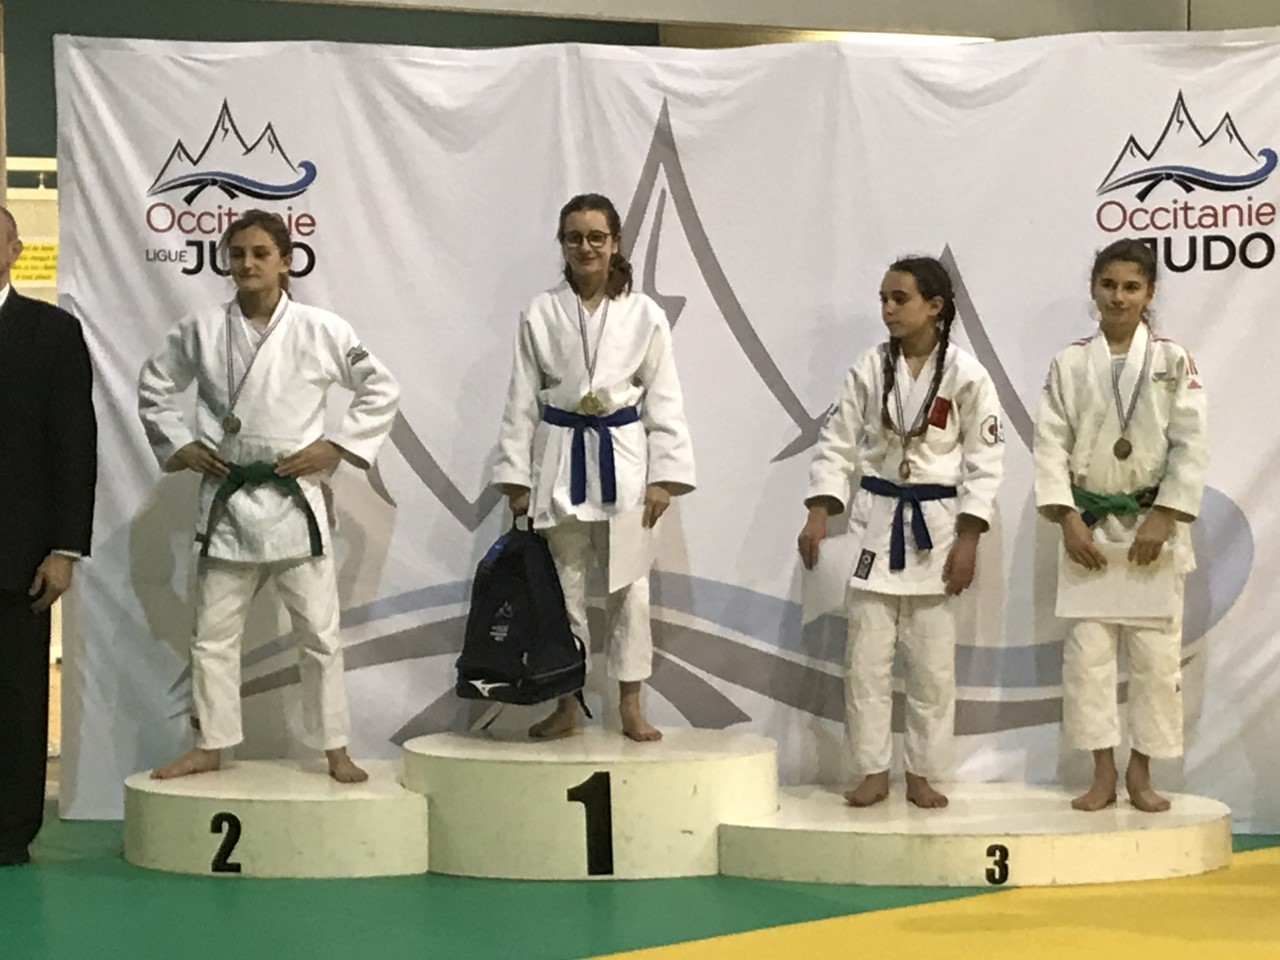 Calendrier Judo Occitanie.Vinicius Bastazini Vice Champion De France Dojo Du